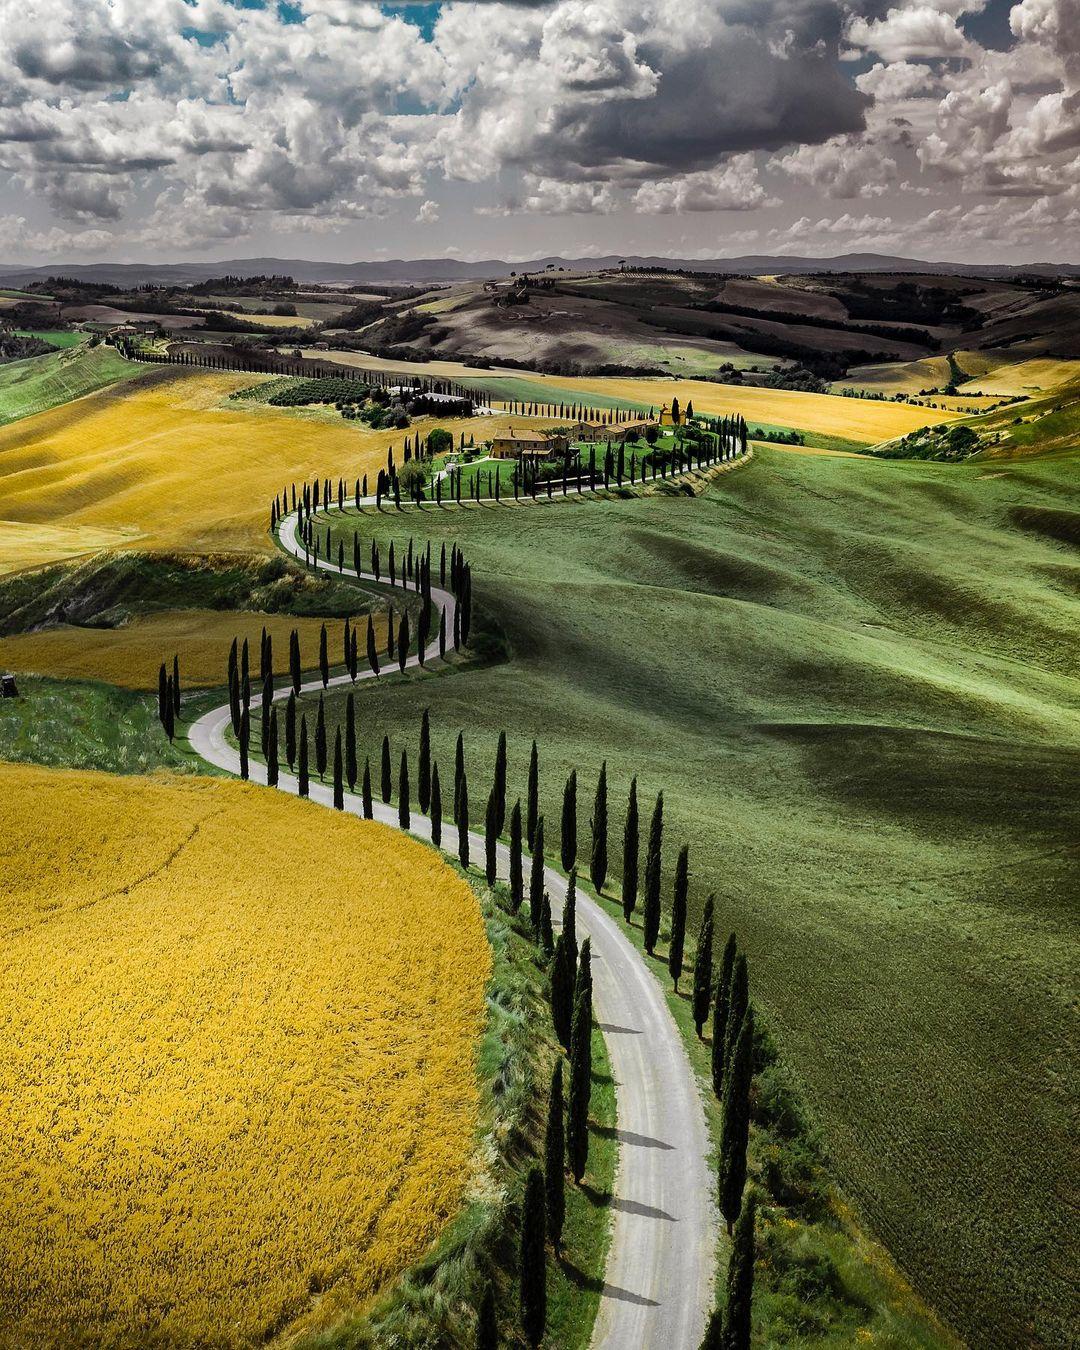 Захватывающие пейзажи Италии на снимках Макса Лацци